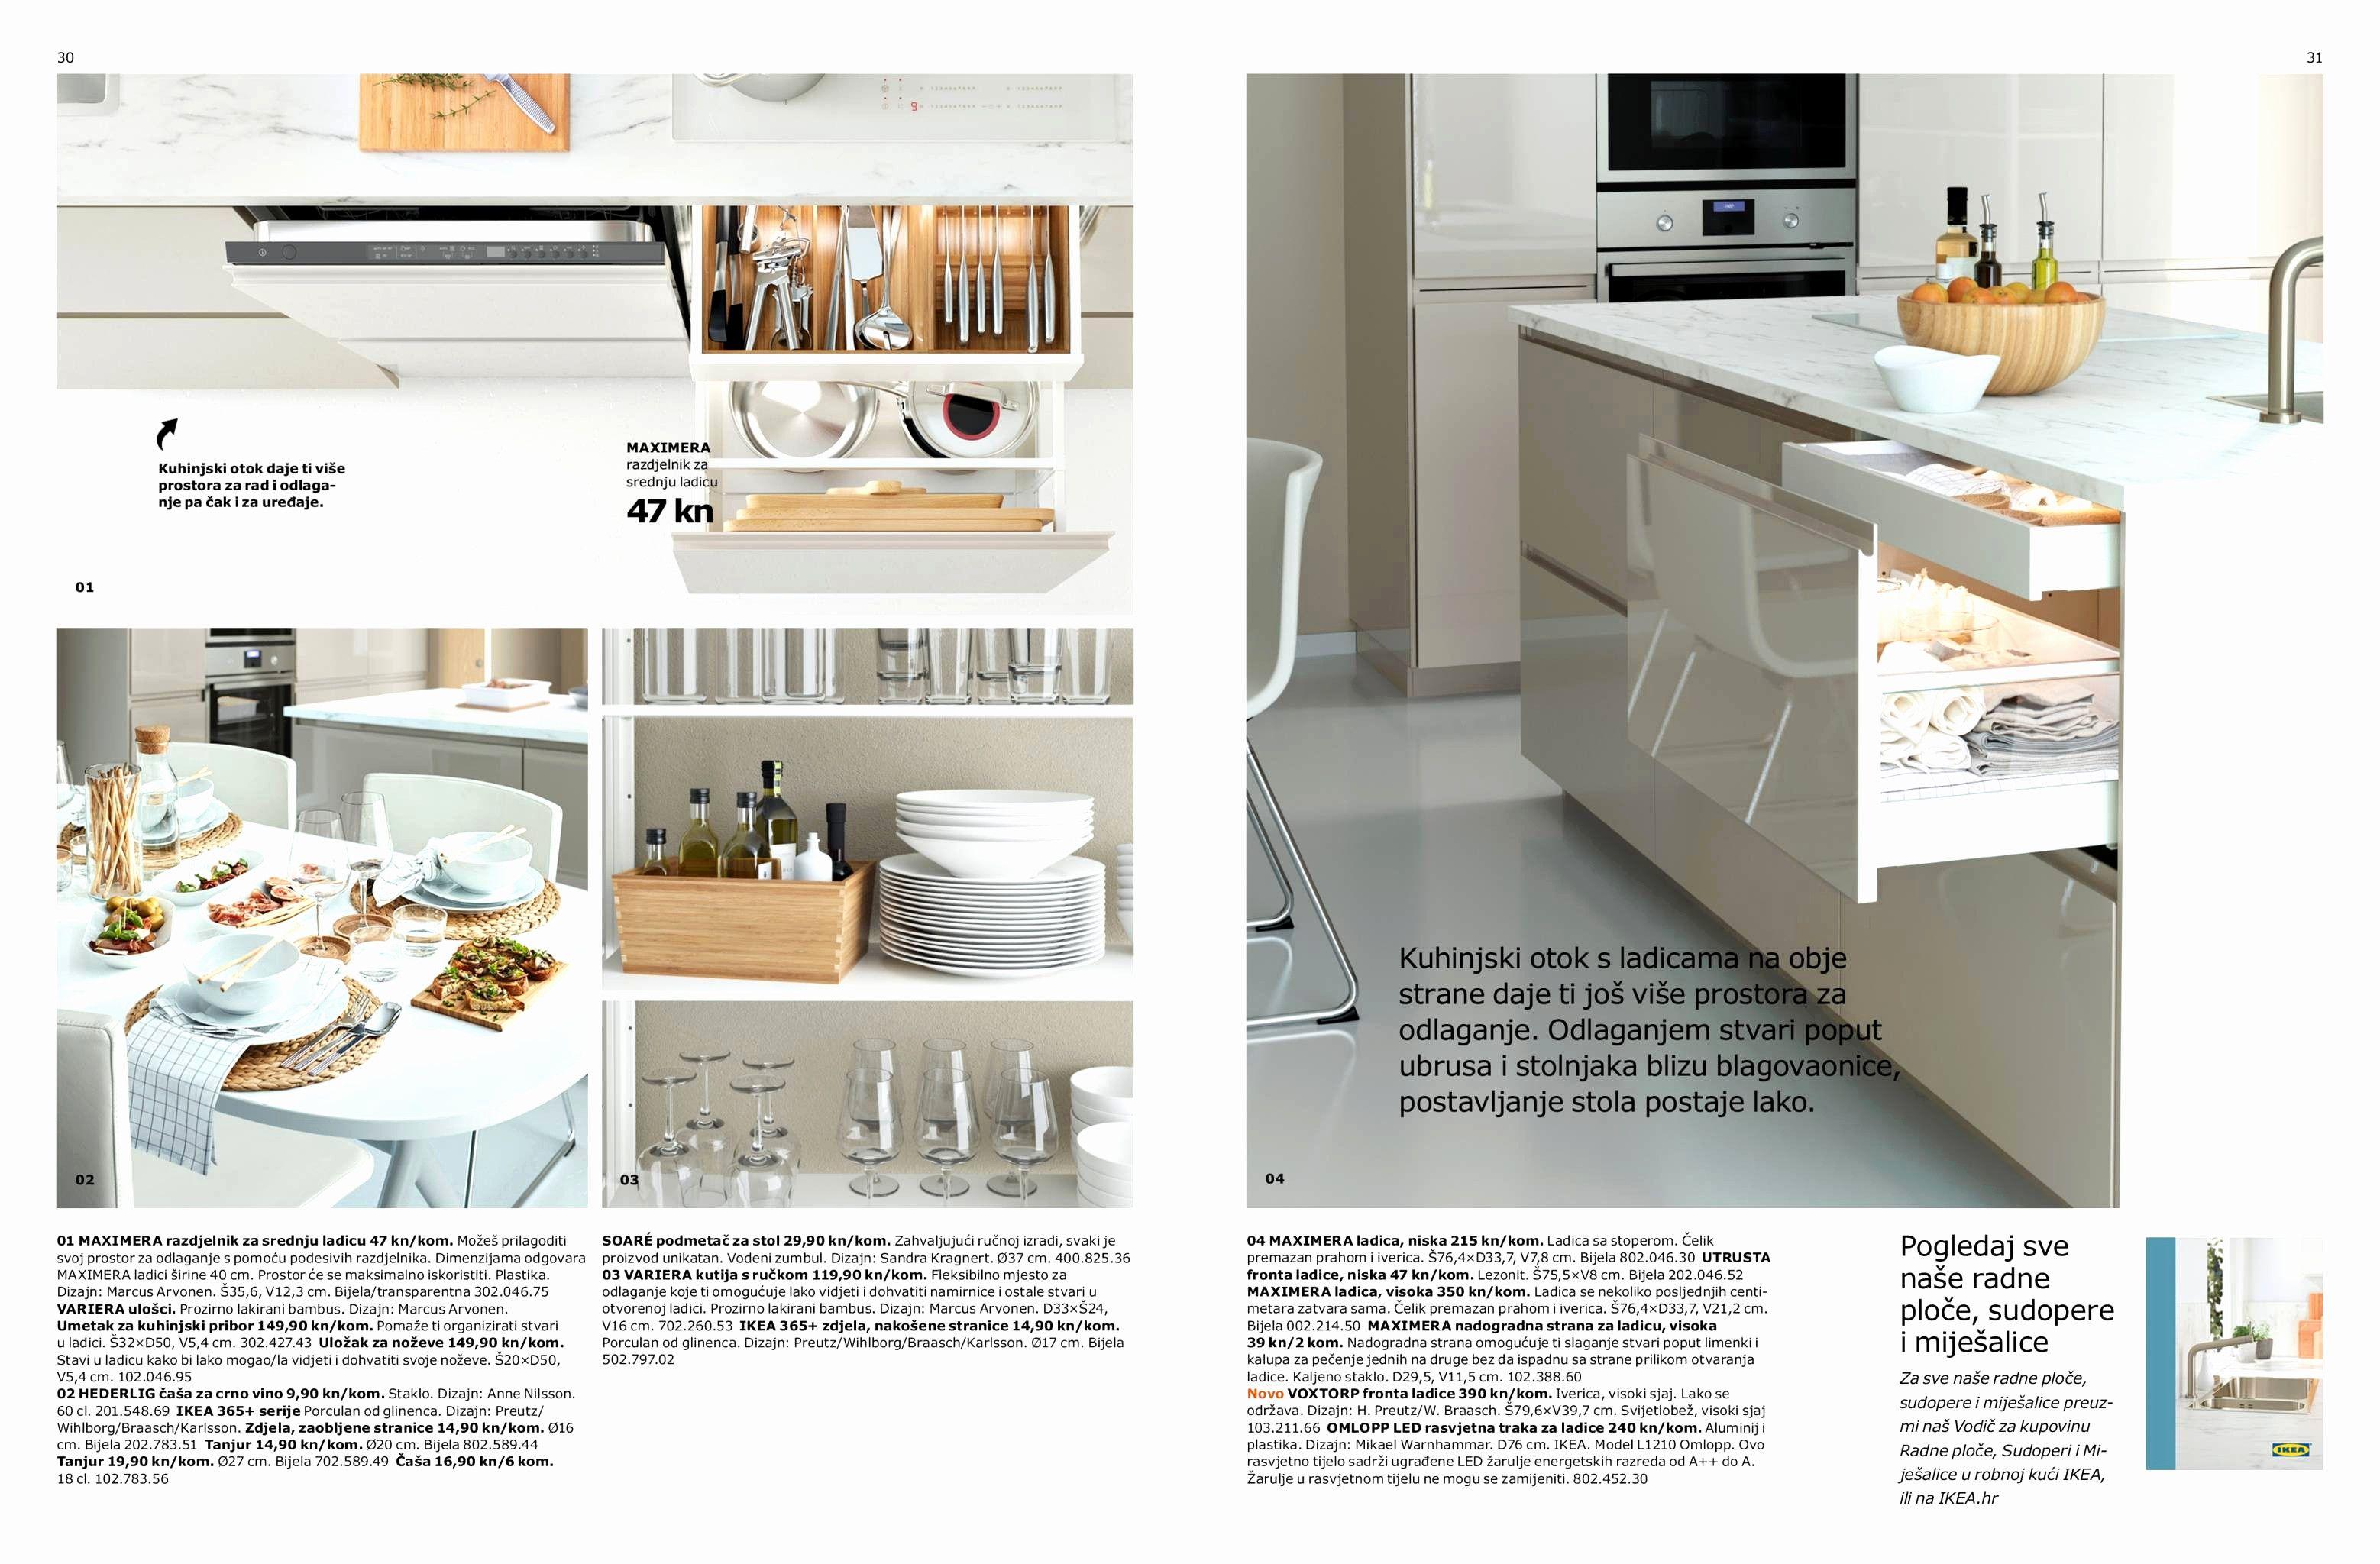 Best Of Conforama Paiement En Plusieurs Fois Kitchen Island With Drawers Cuisine Ikea Kitchen